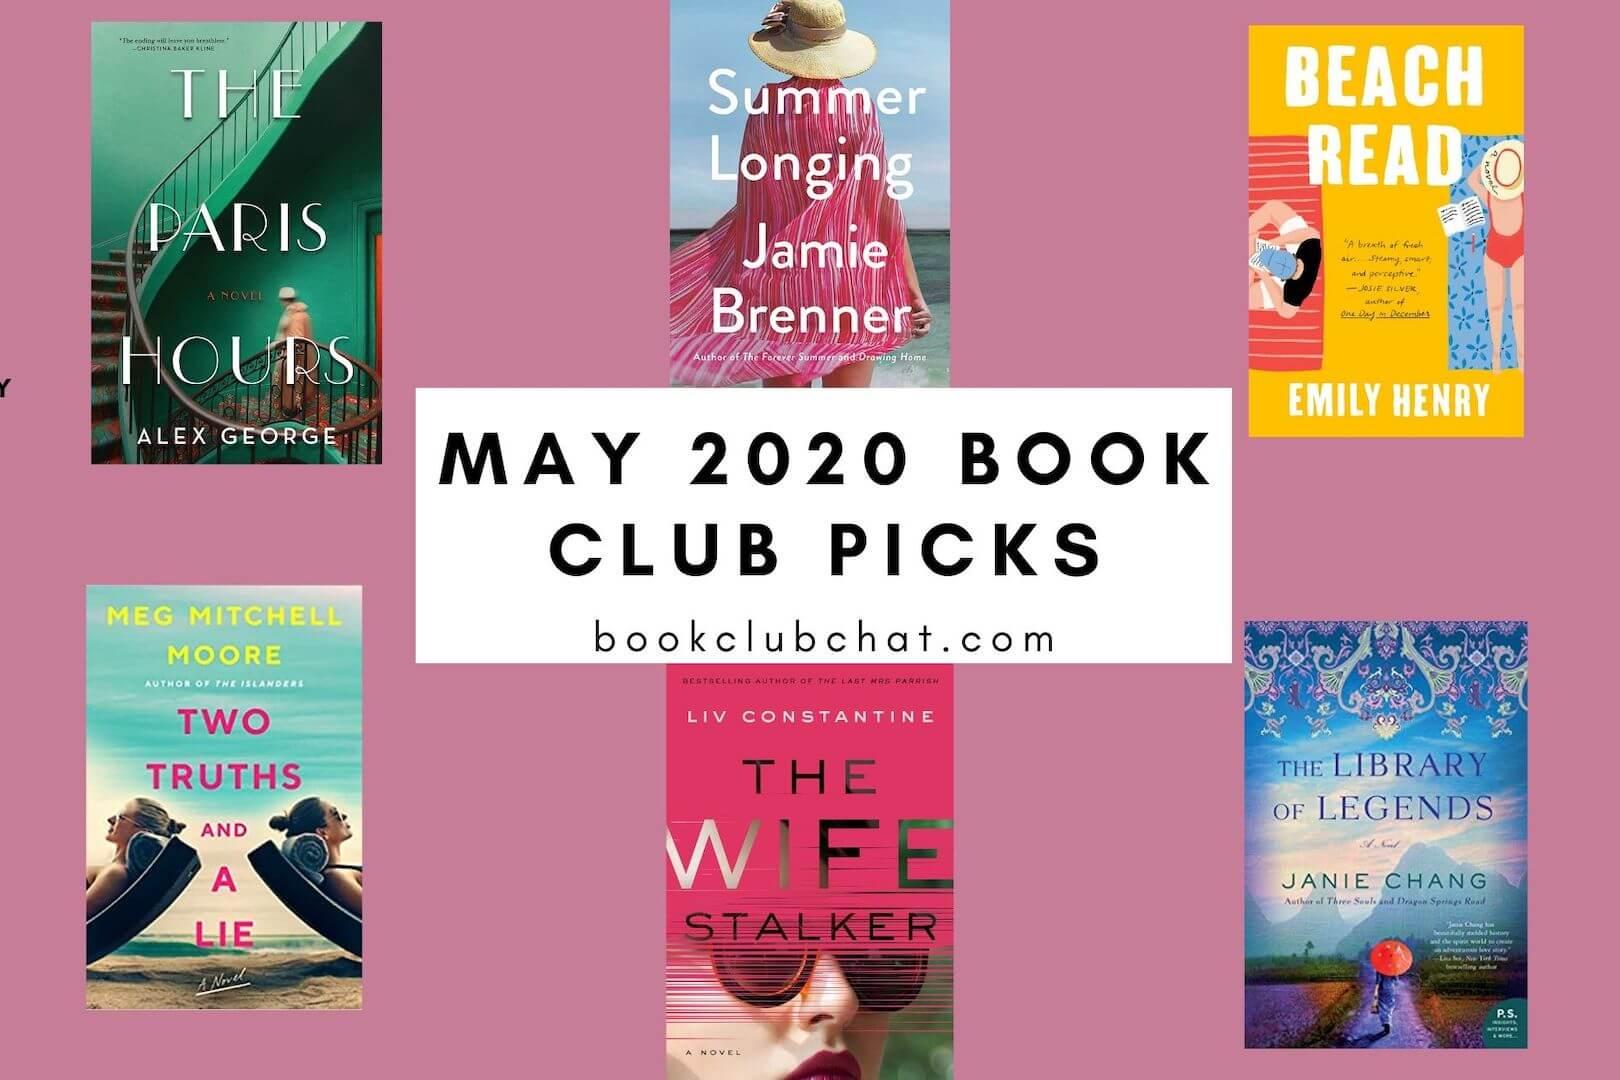 may 2020 book club picks - book club chat